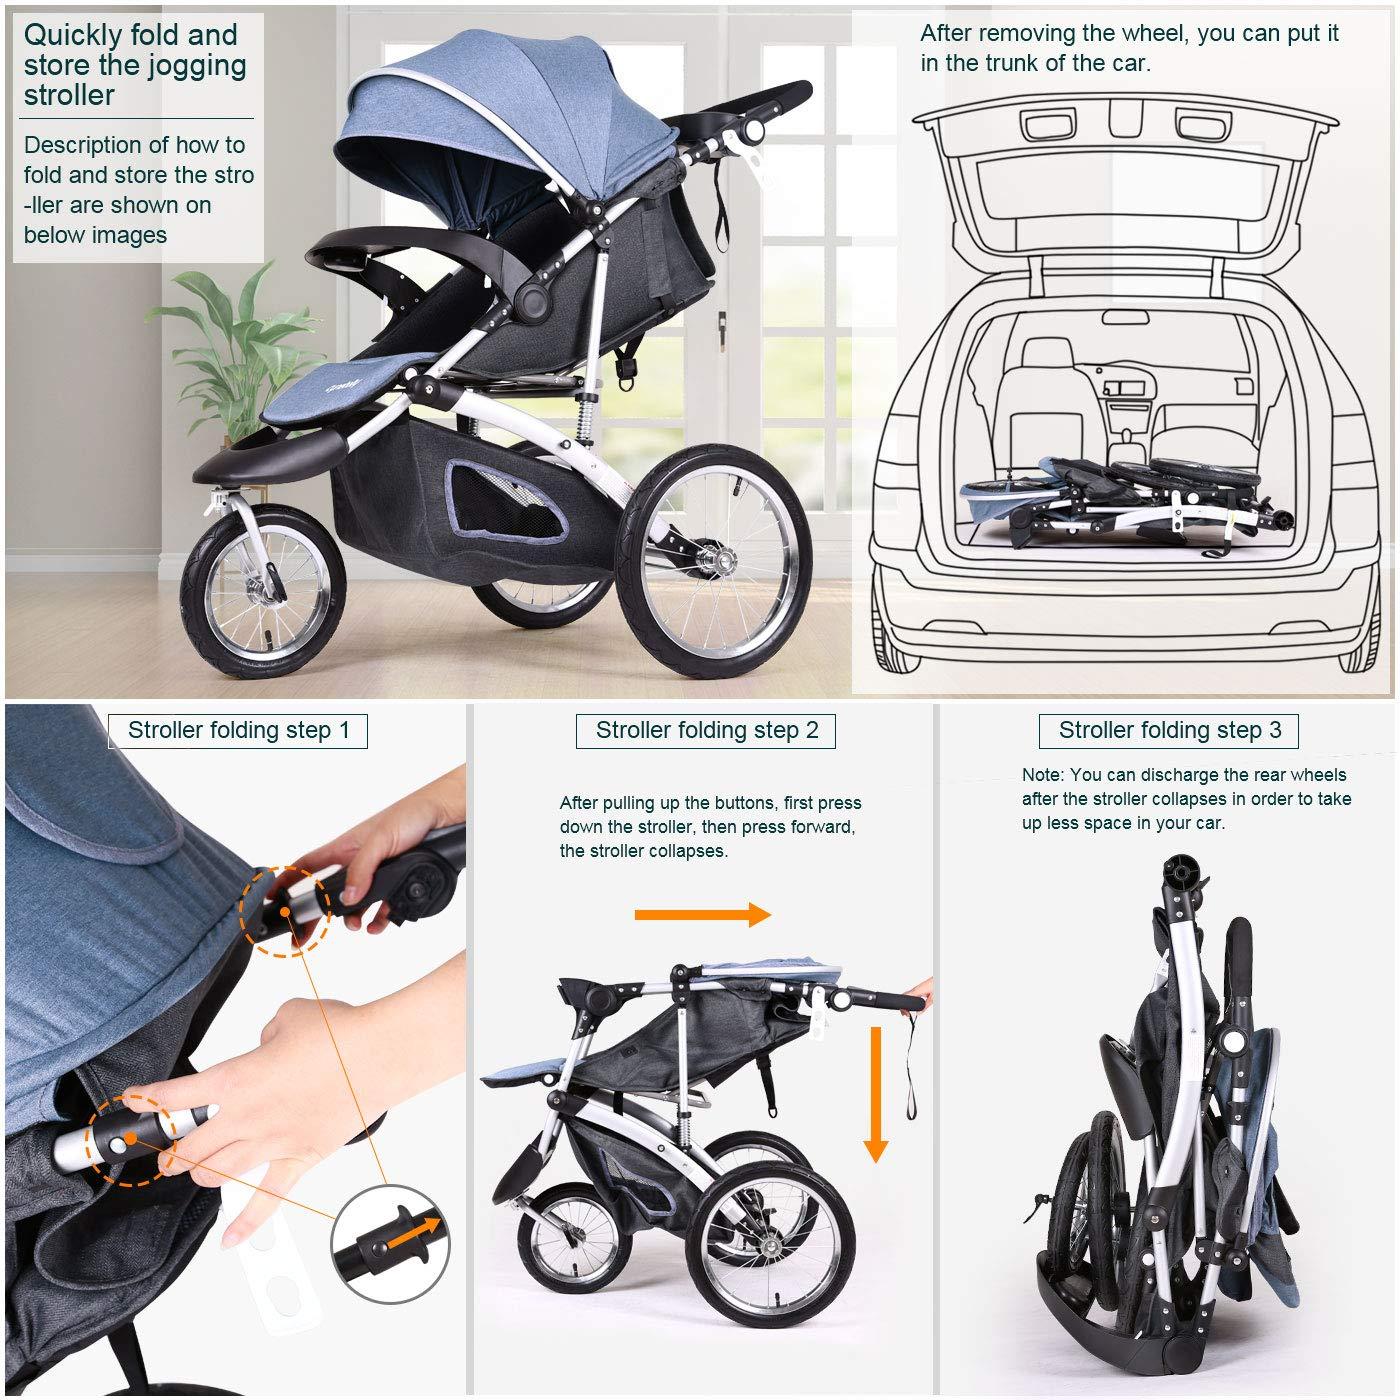 Jogging Stroller Fold City Travel Citi Jog Strollers Single Toddler Baby Pram Jogging Compact Urban Ultralight Joggers Beby Carriage Pushchair Stroller Travel System